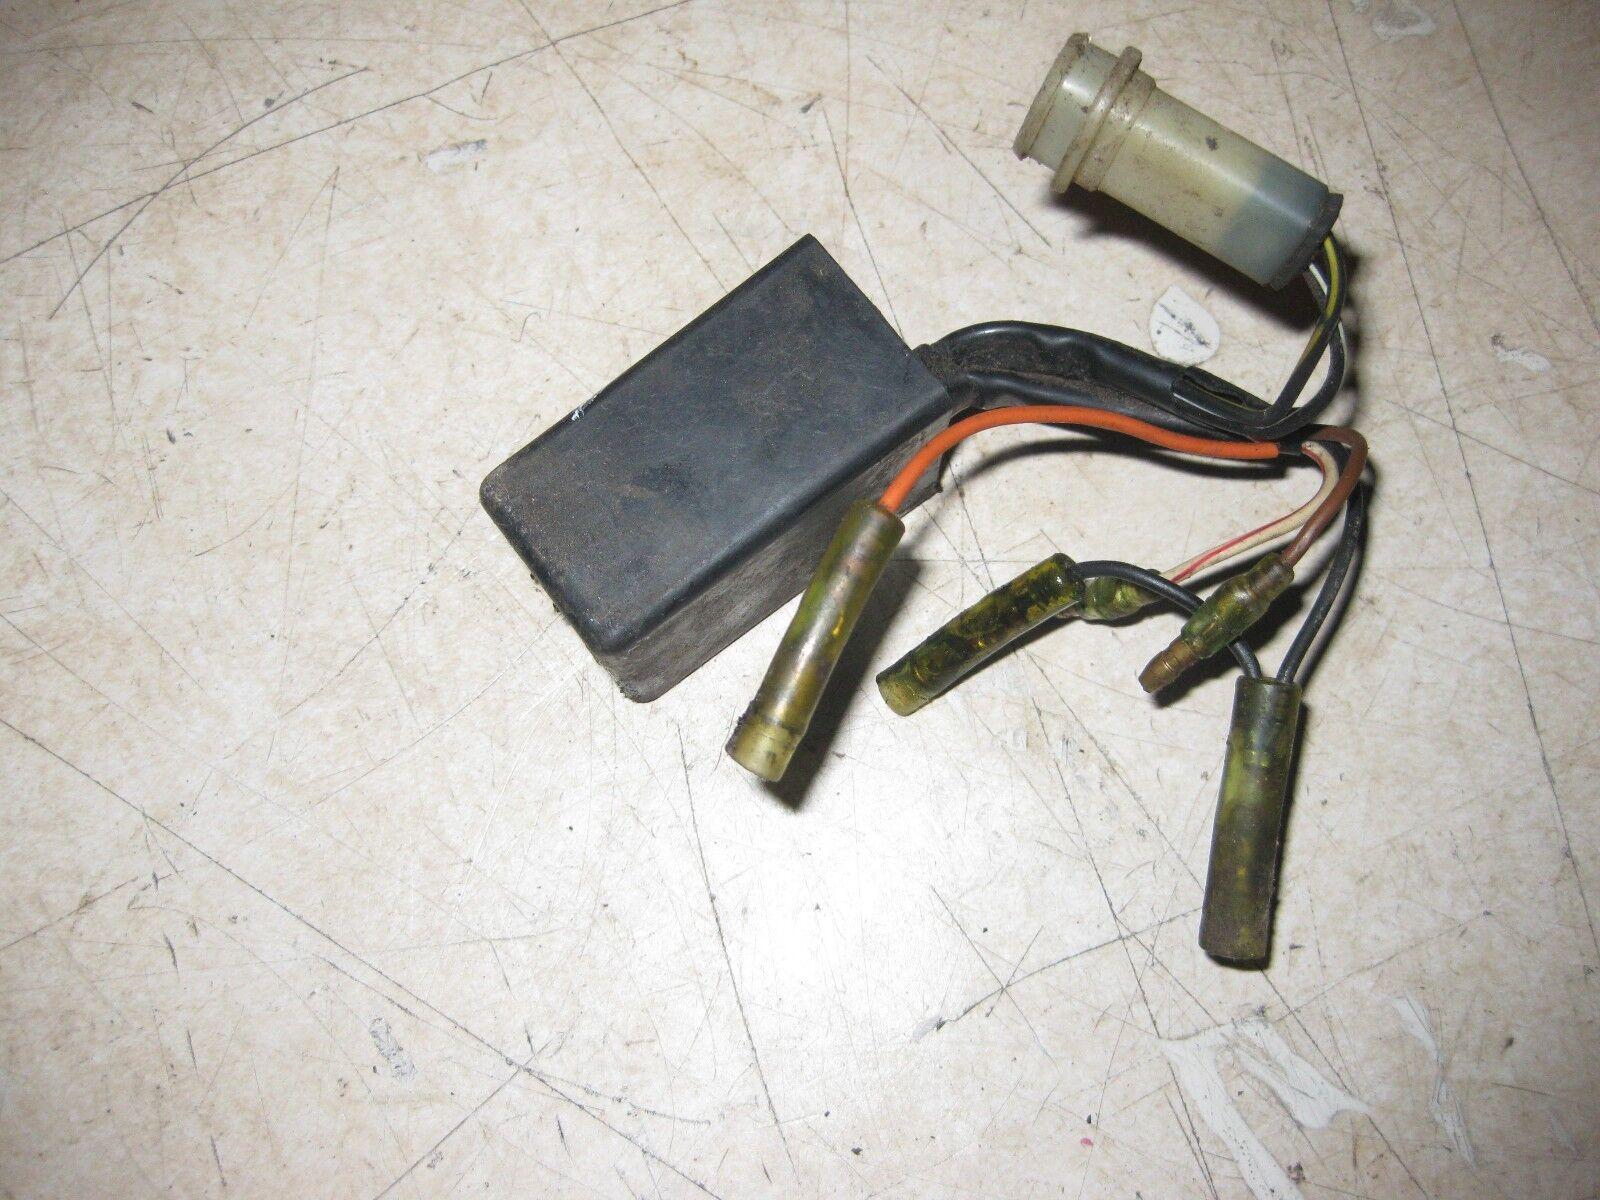 91 92 90 89 88 87 86 85 84 YAMAHA PHAZER pz485 CDI 480 box unit ignition igniter